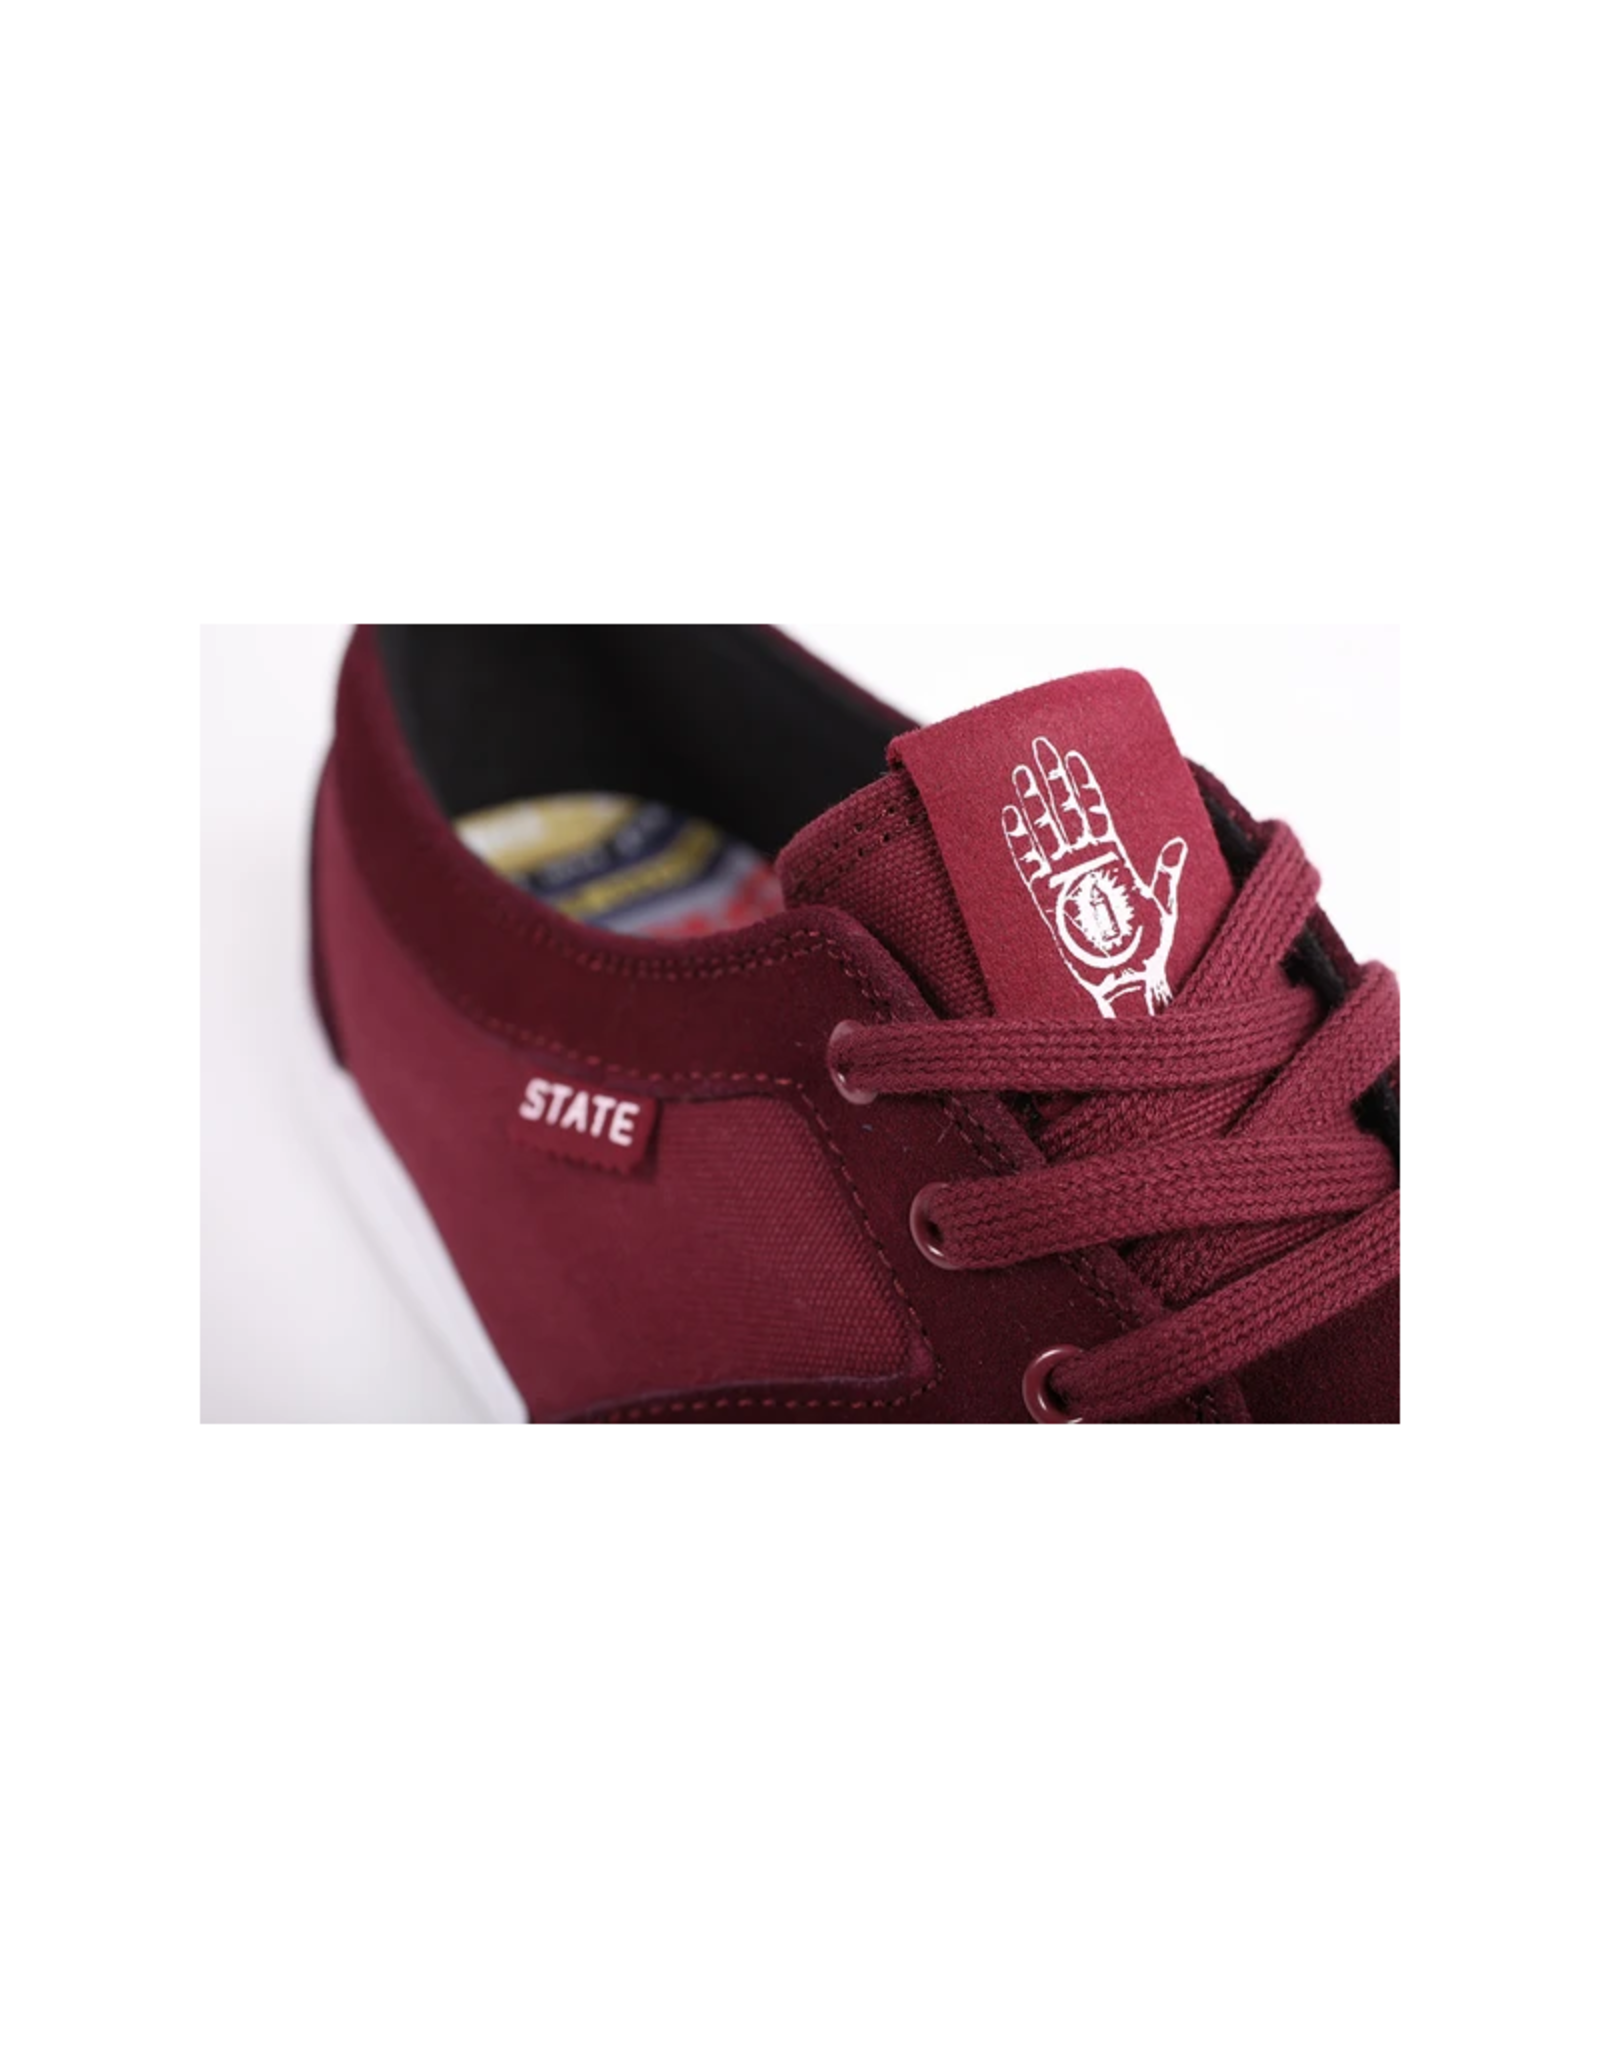 STATE FOOTWARE STATE FOOTWEAR X THEORIES BISHOP SHOE CHERRY